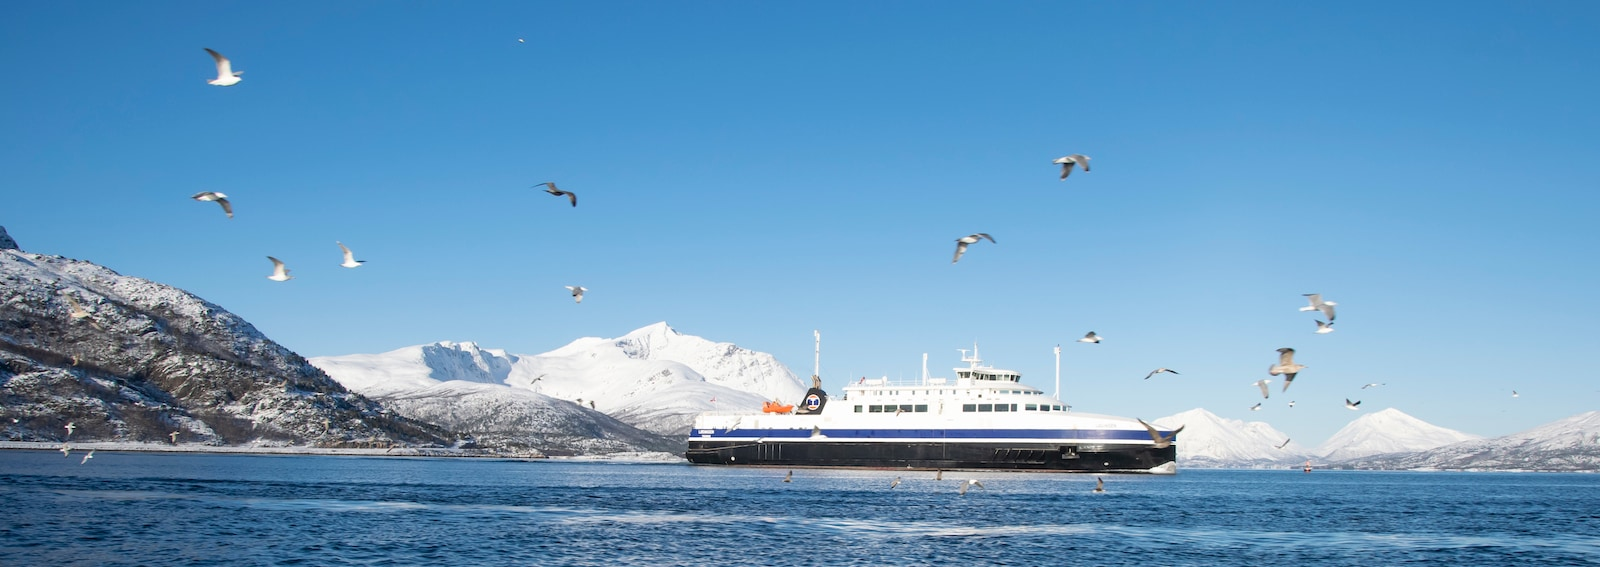 nave barca norvegia